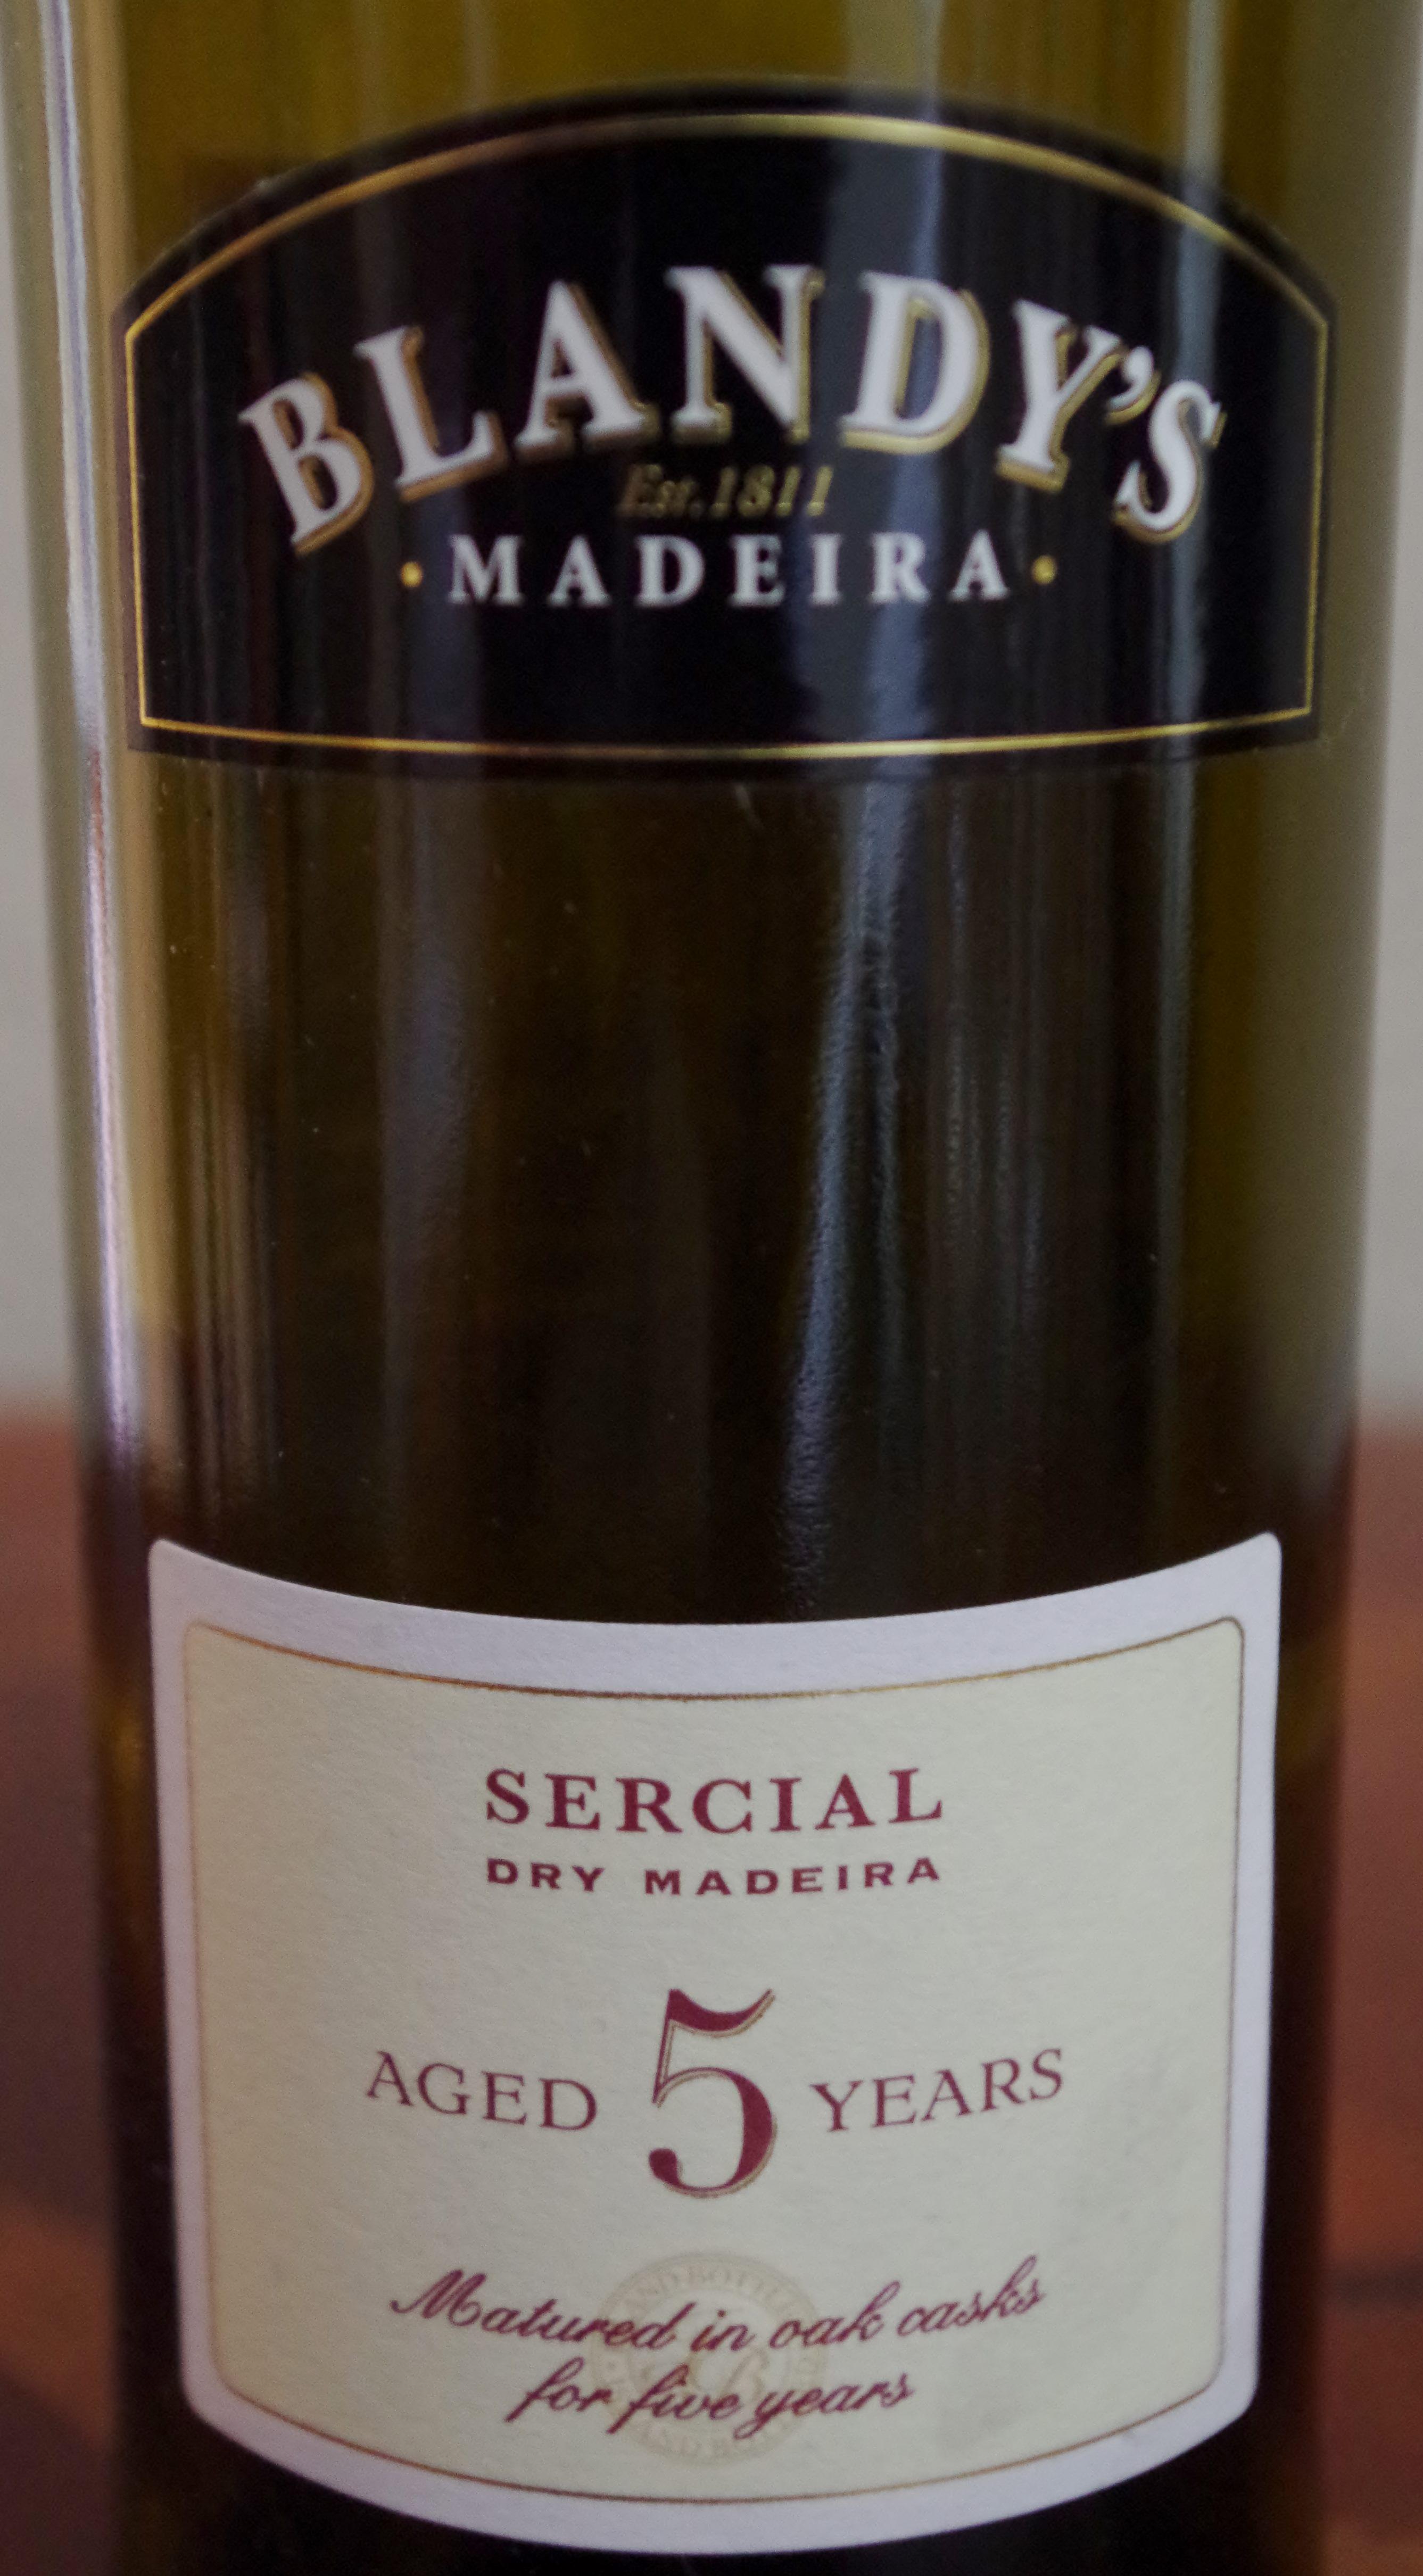 Blandy's Sercial Madeira